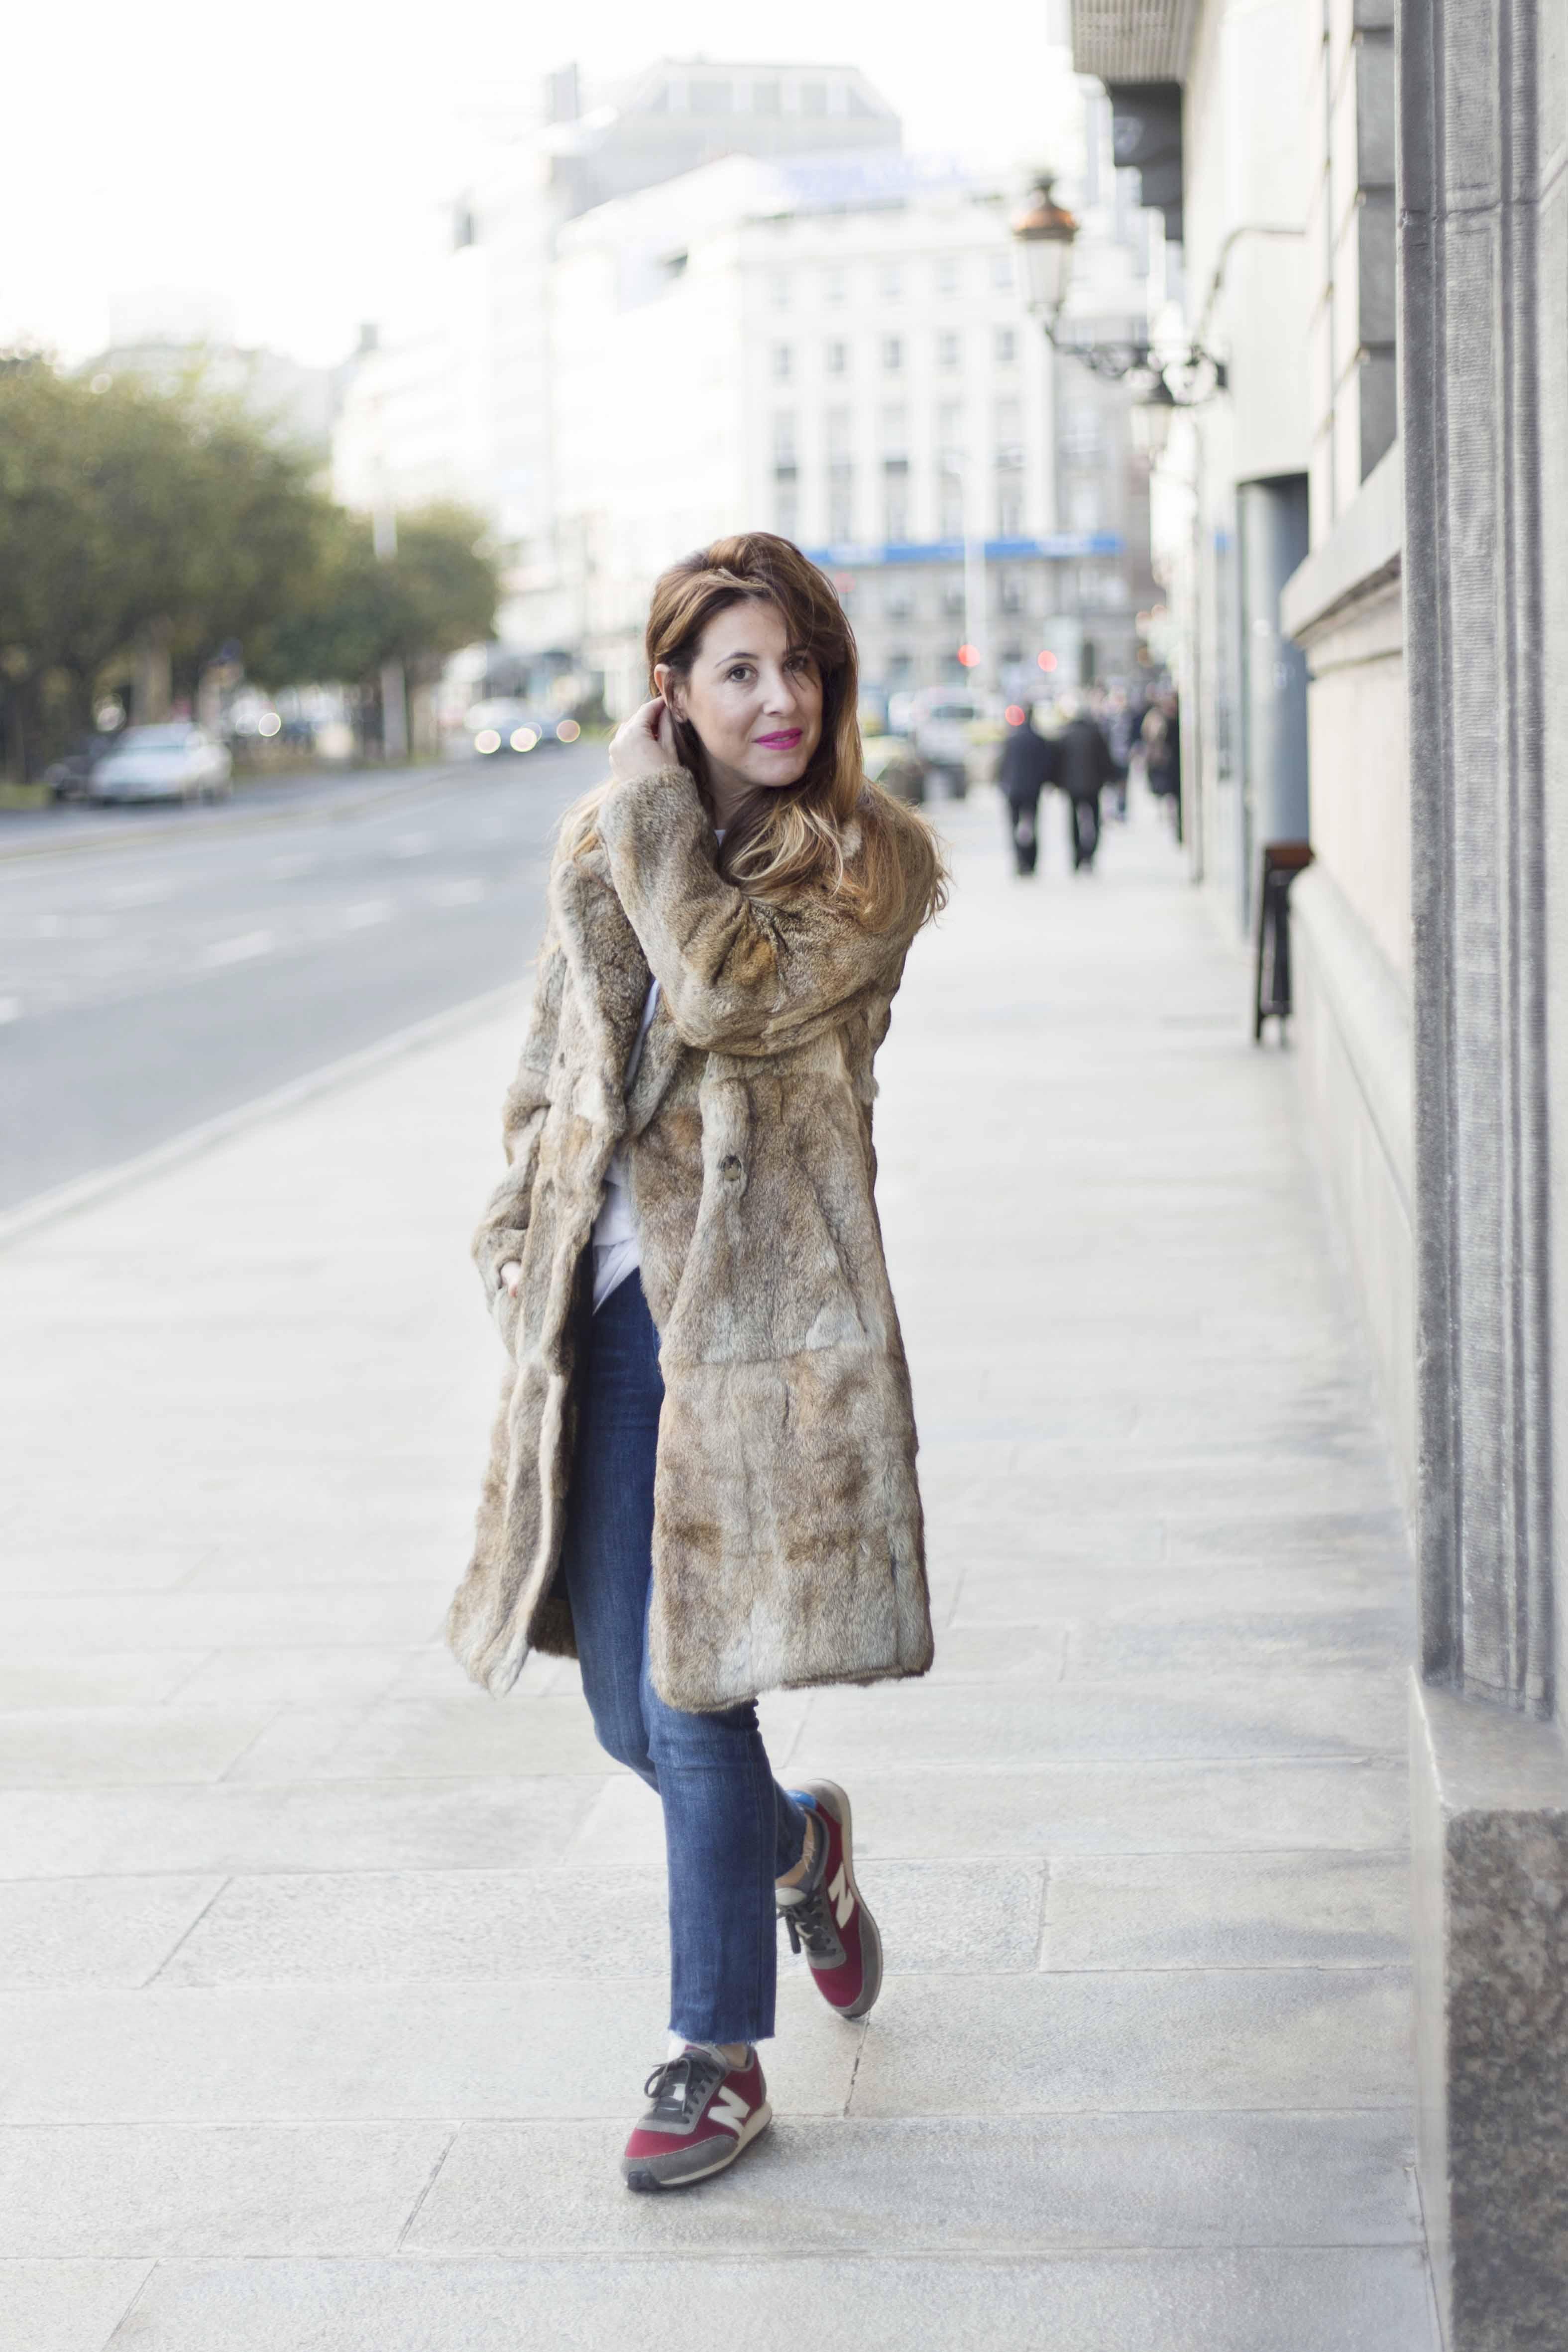 merry-coat-SANDRO-street-style-coruñna-descalzaporelparque-fur-moda-fashion